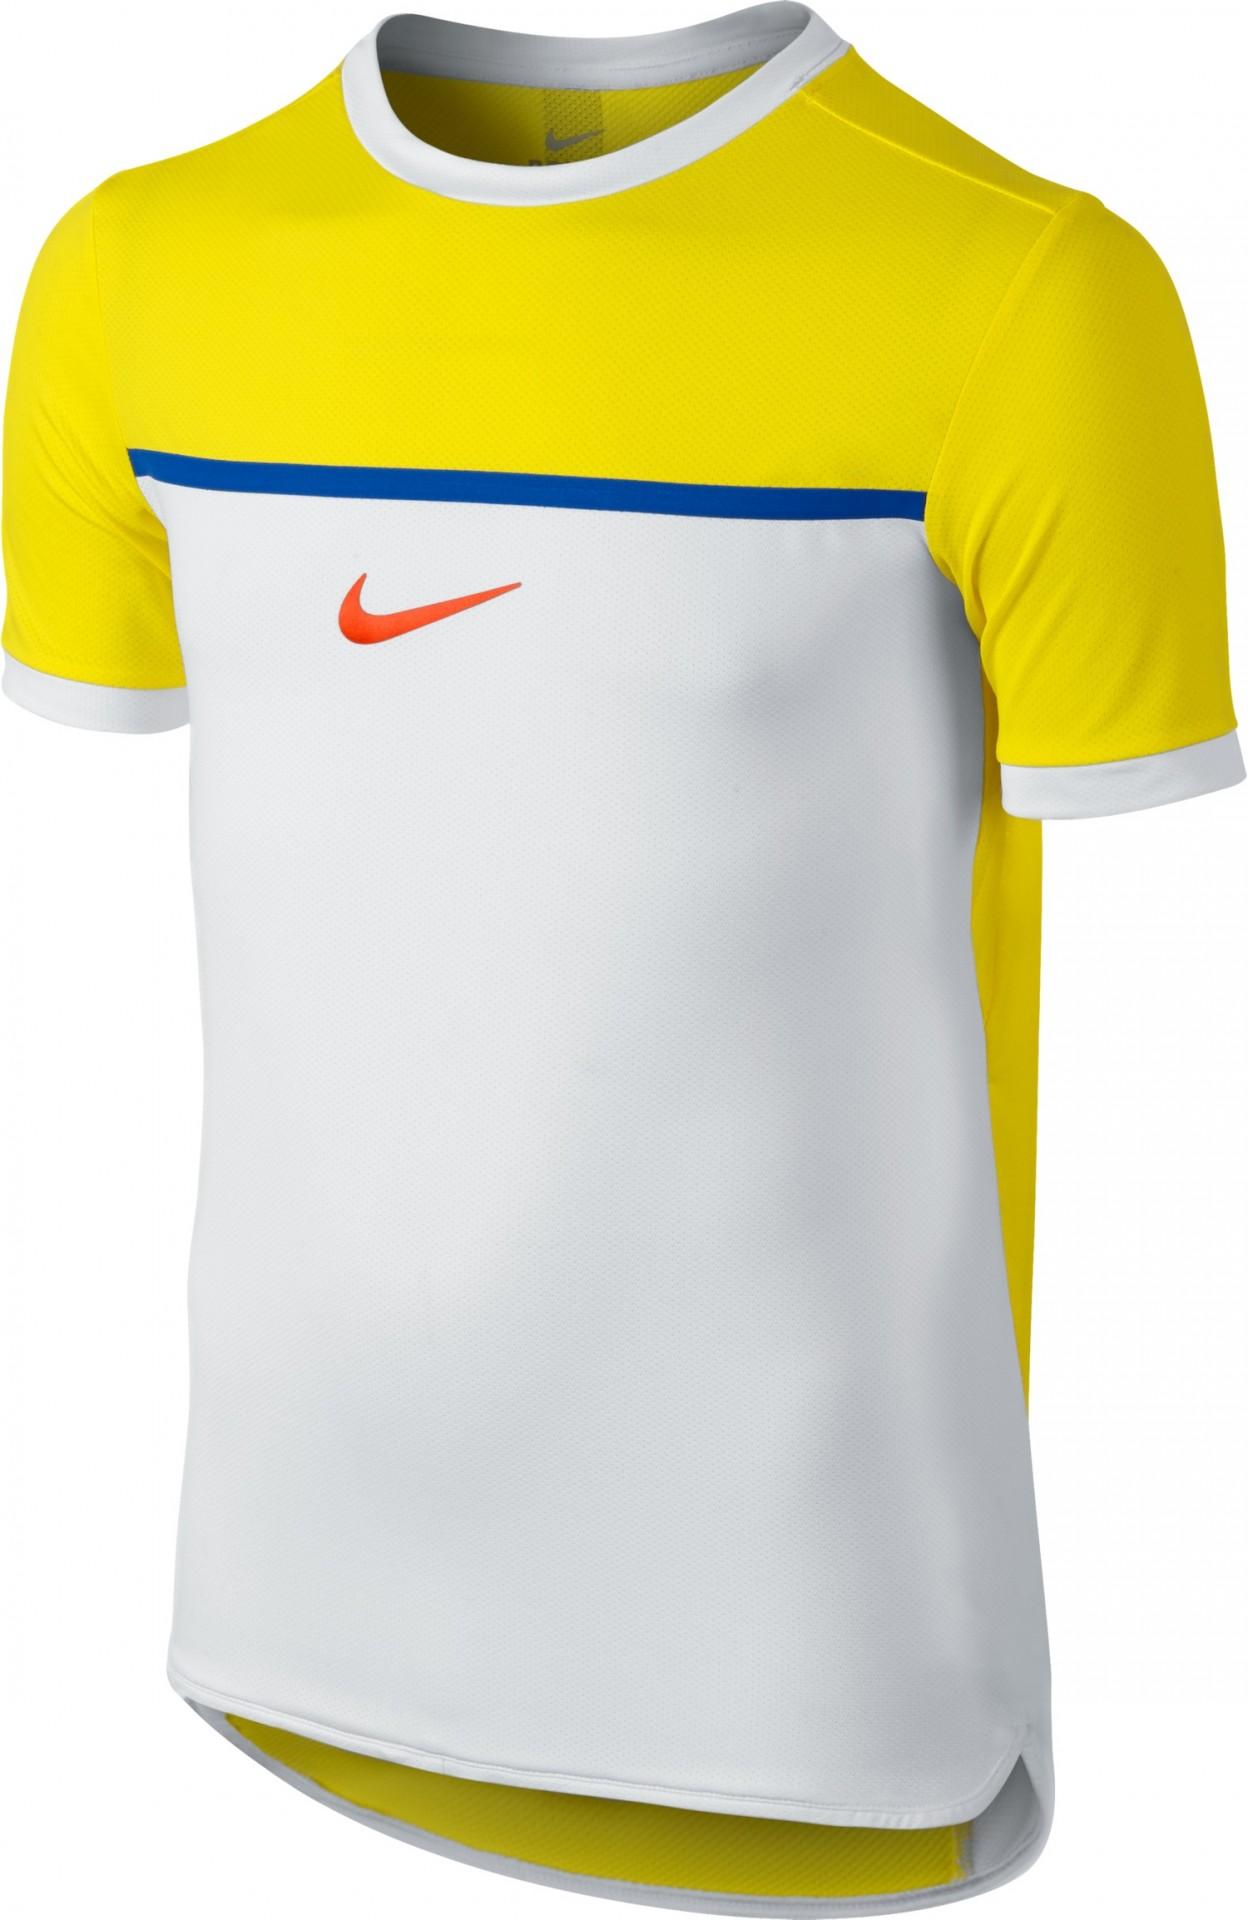 huge selection of c821d 29edd Jungen Tennis T-Shirt Nike Challenger Premier Rafa Crew ...